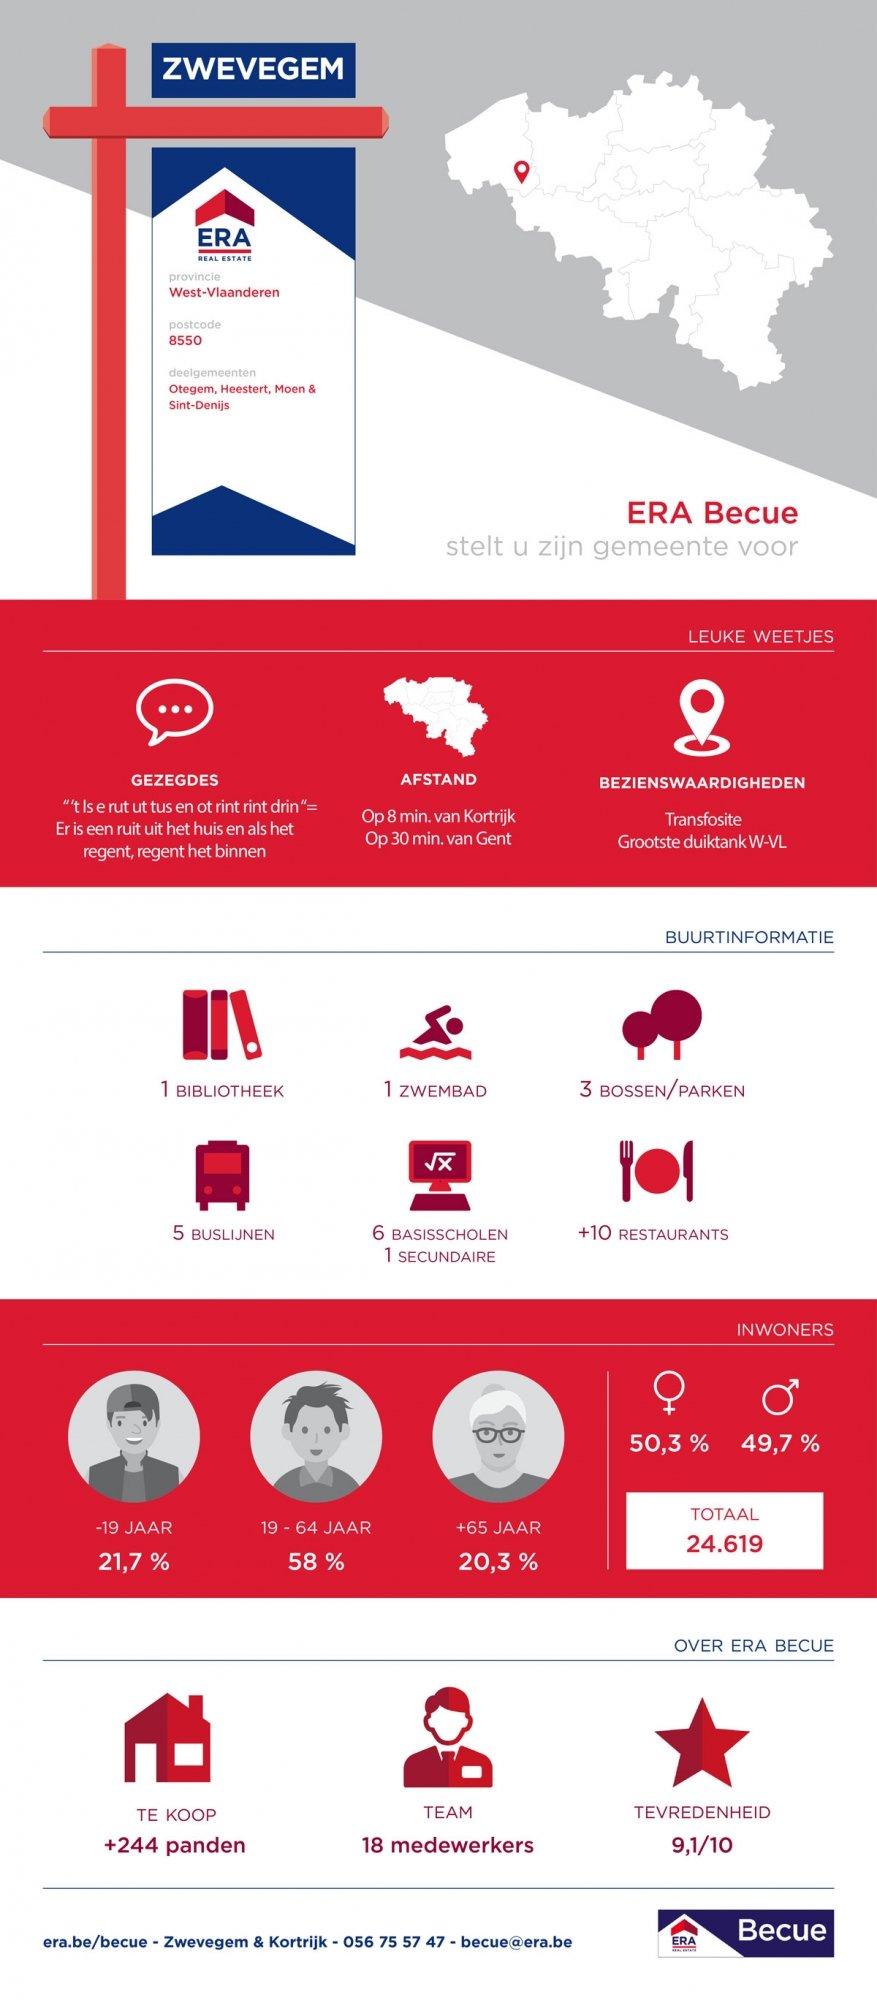 infographic - wonen in Zwevegem - Immokantoor ERA Becue in Zwevegem